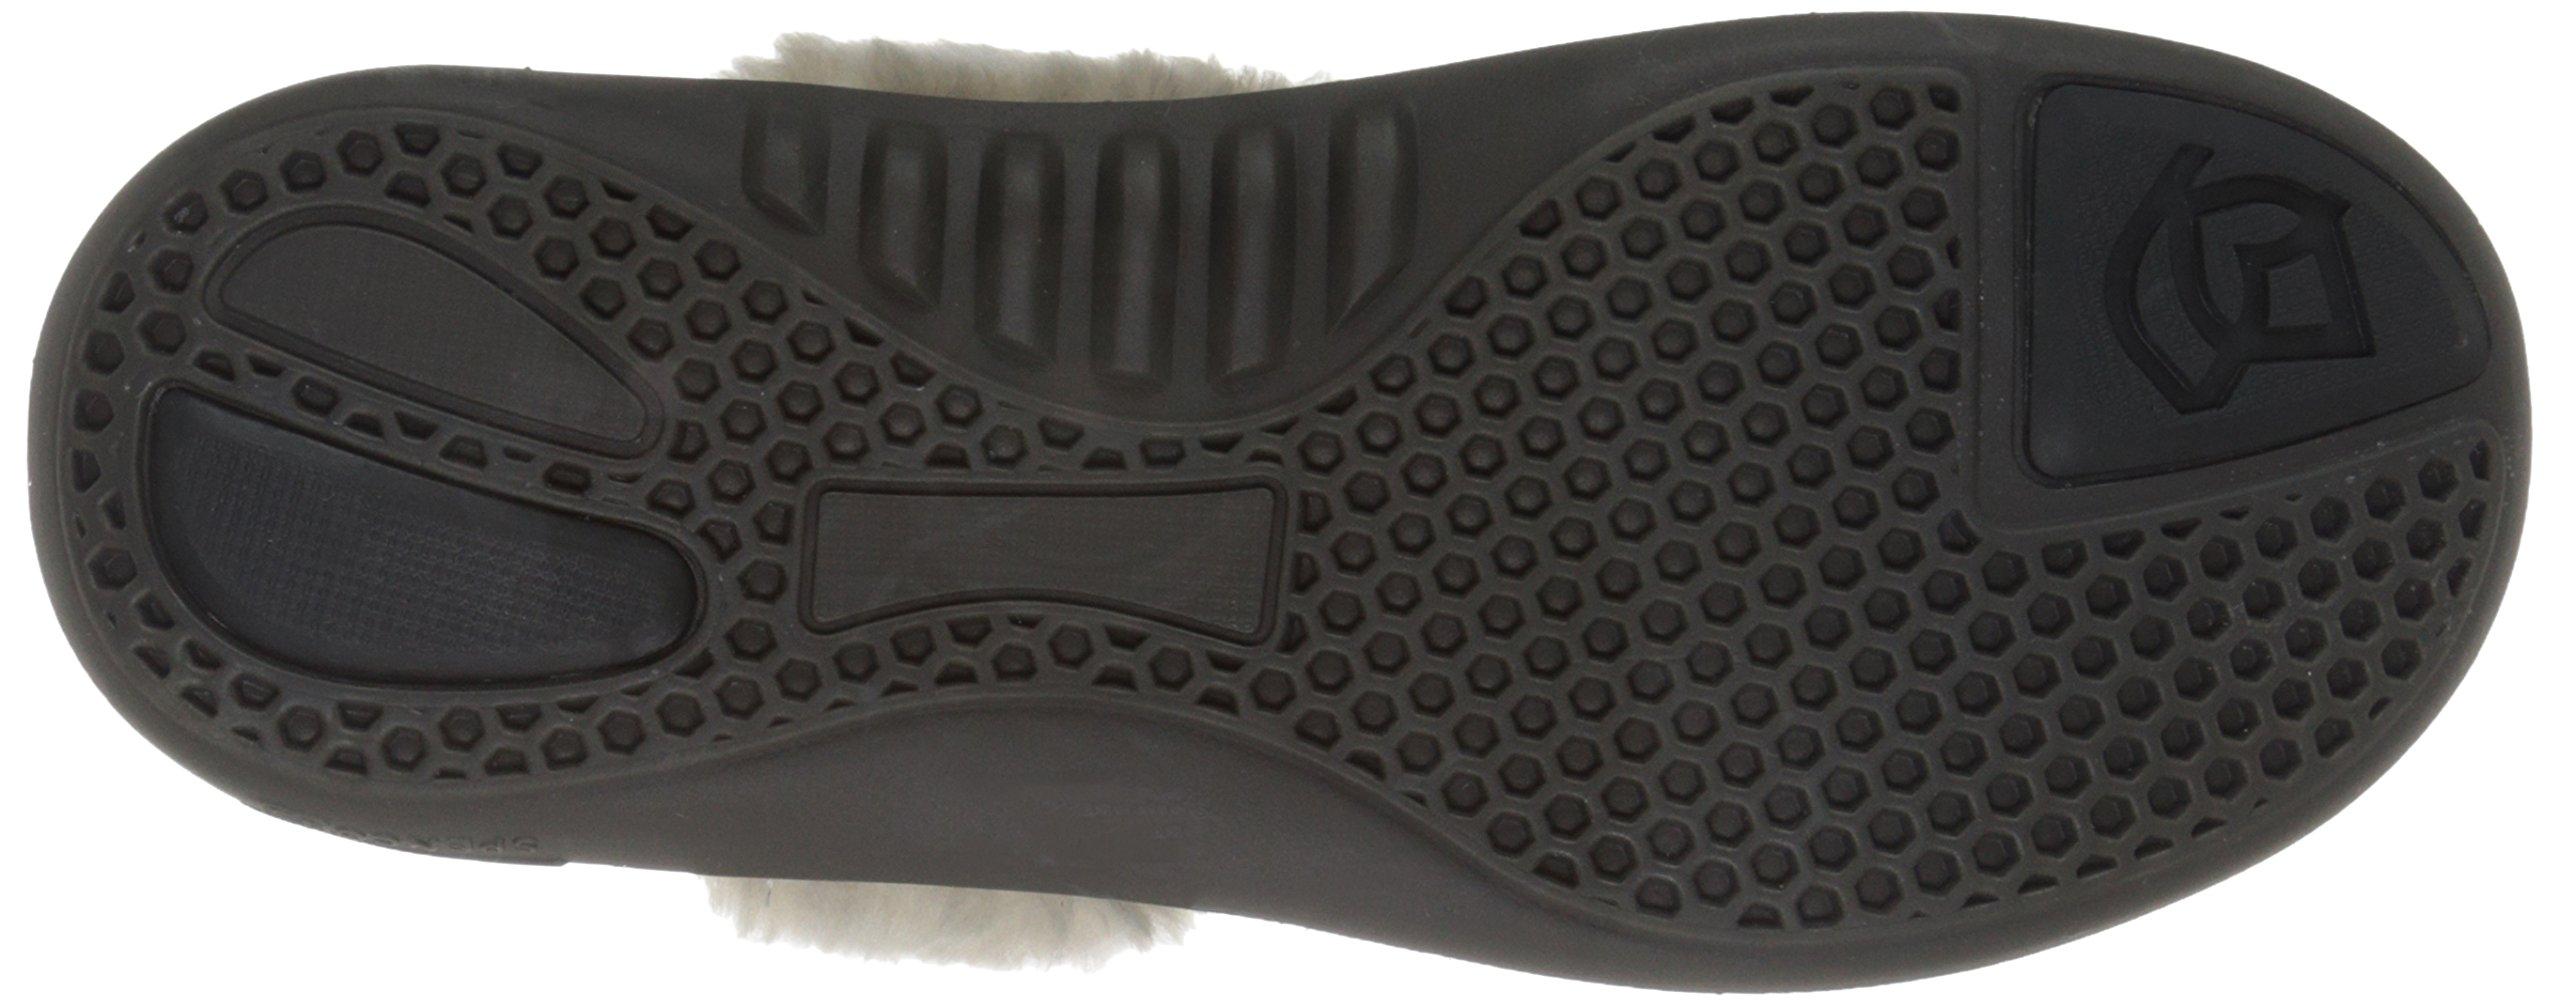 Spenco Women's Supreme Slide Mule, Black, 5 M US by Spenco (Image #3)